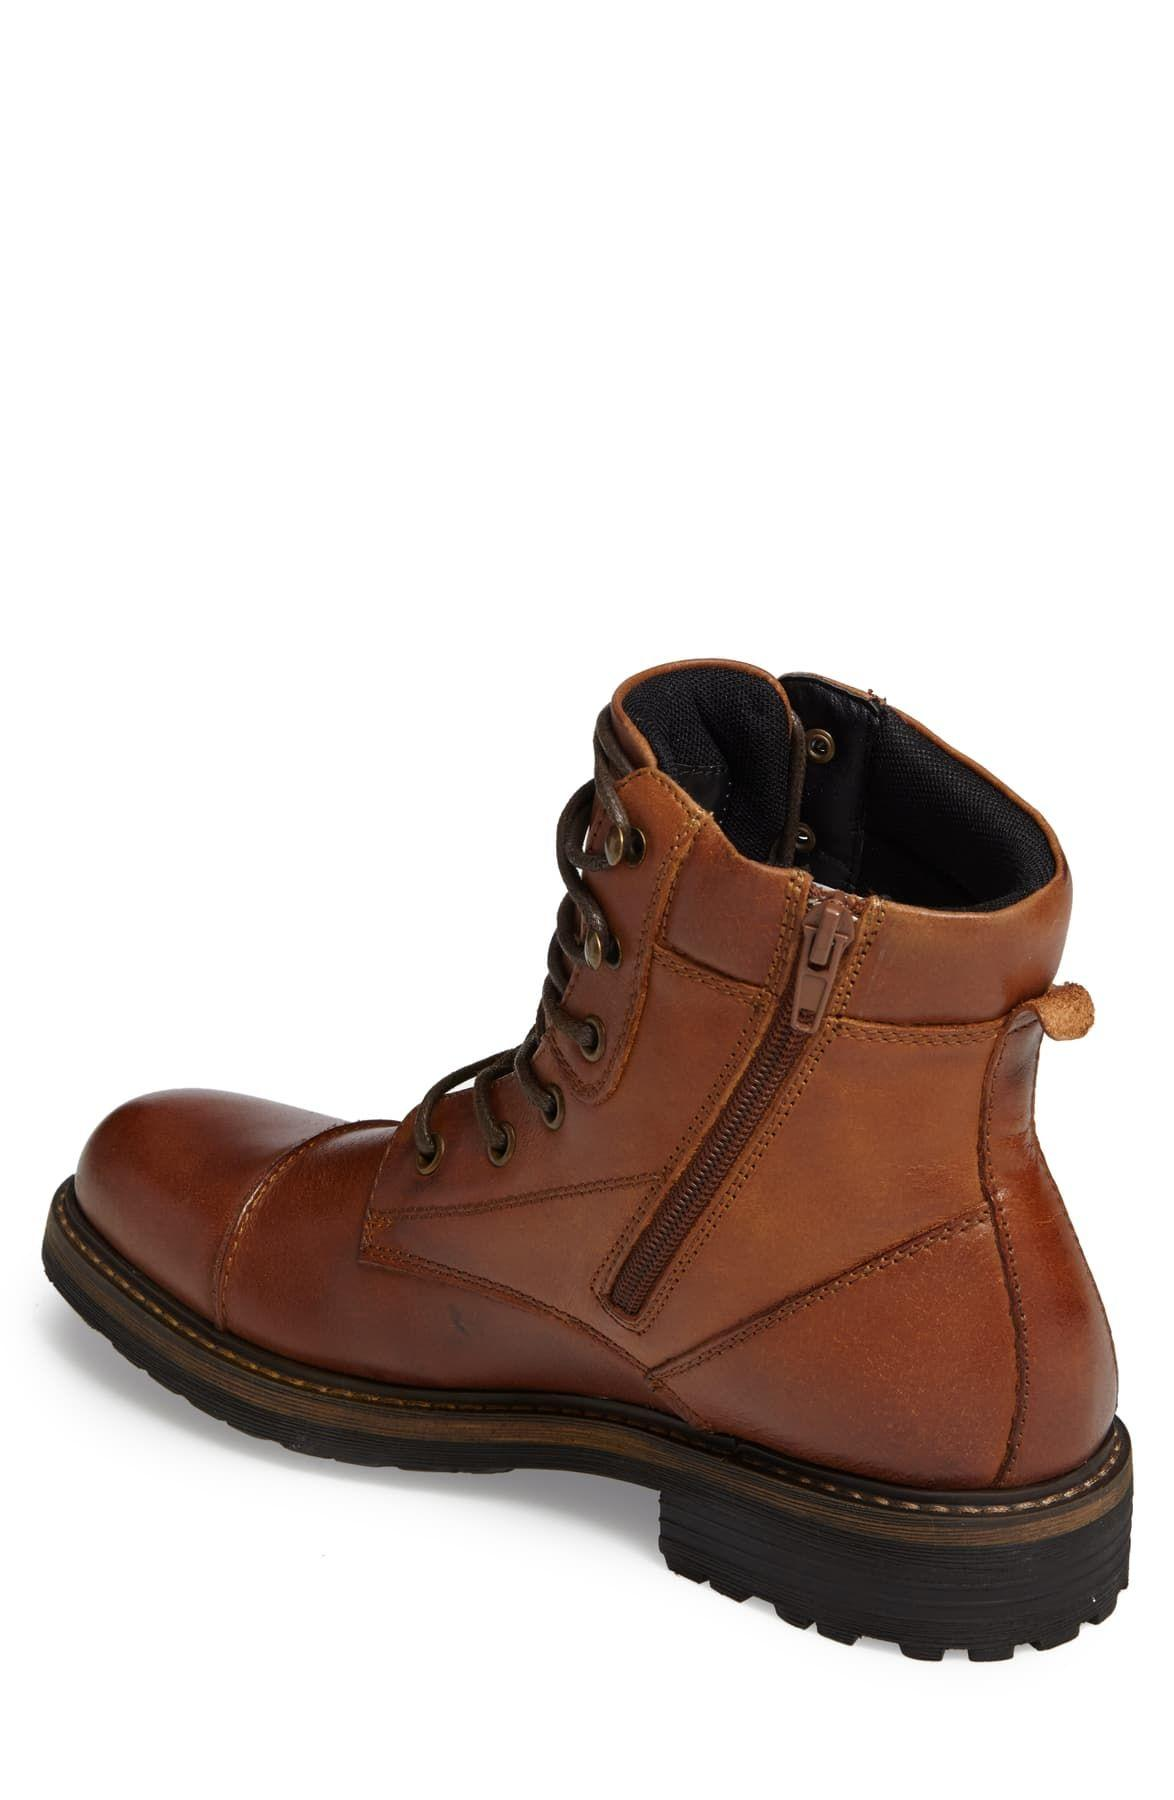 The Rail Leather Derek Cap Toe Boot in